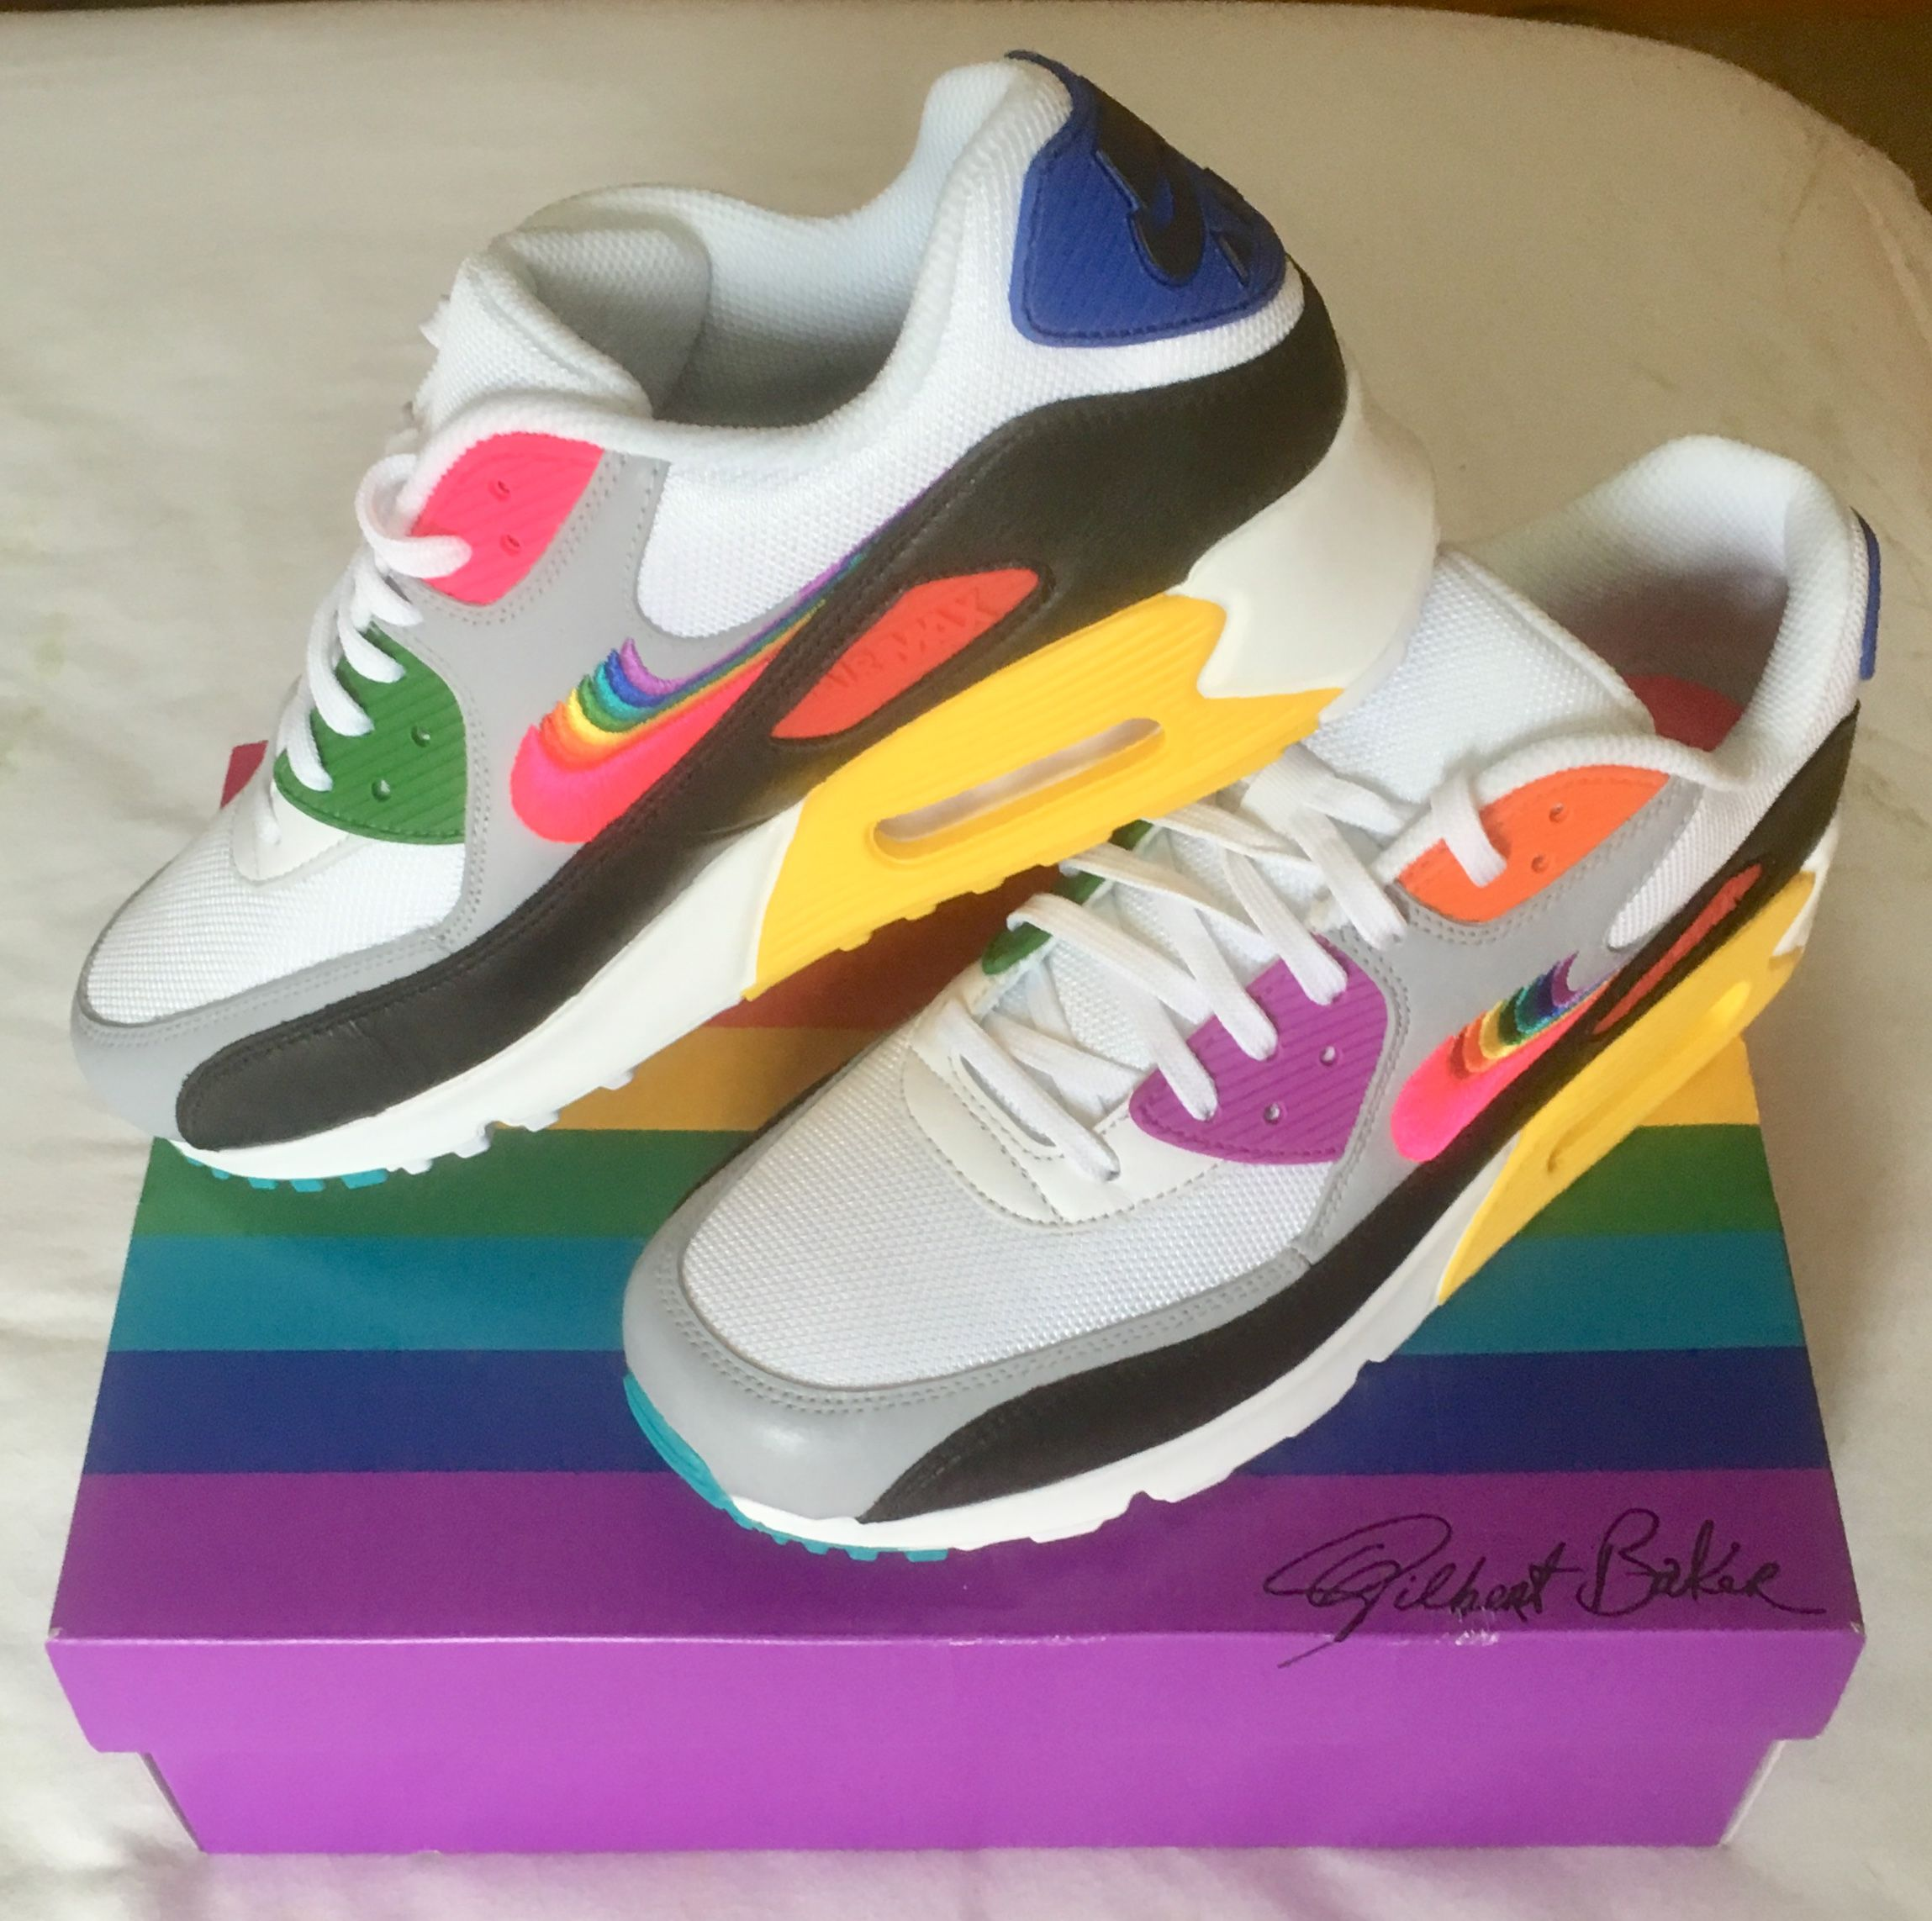 Retro Rainbow Sneakers : Nike Be True